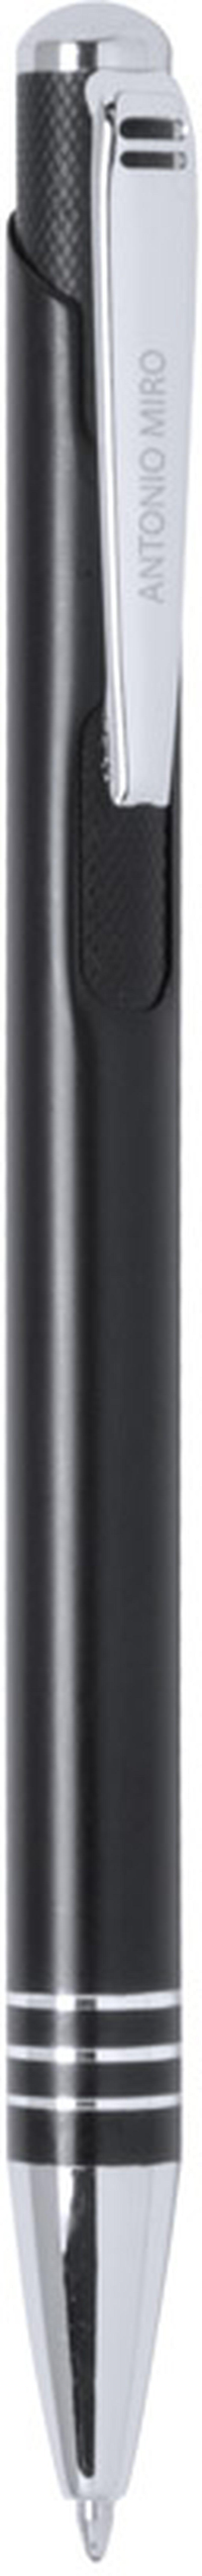 Helmor kuličkové pero